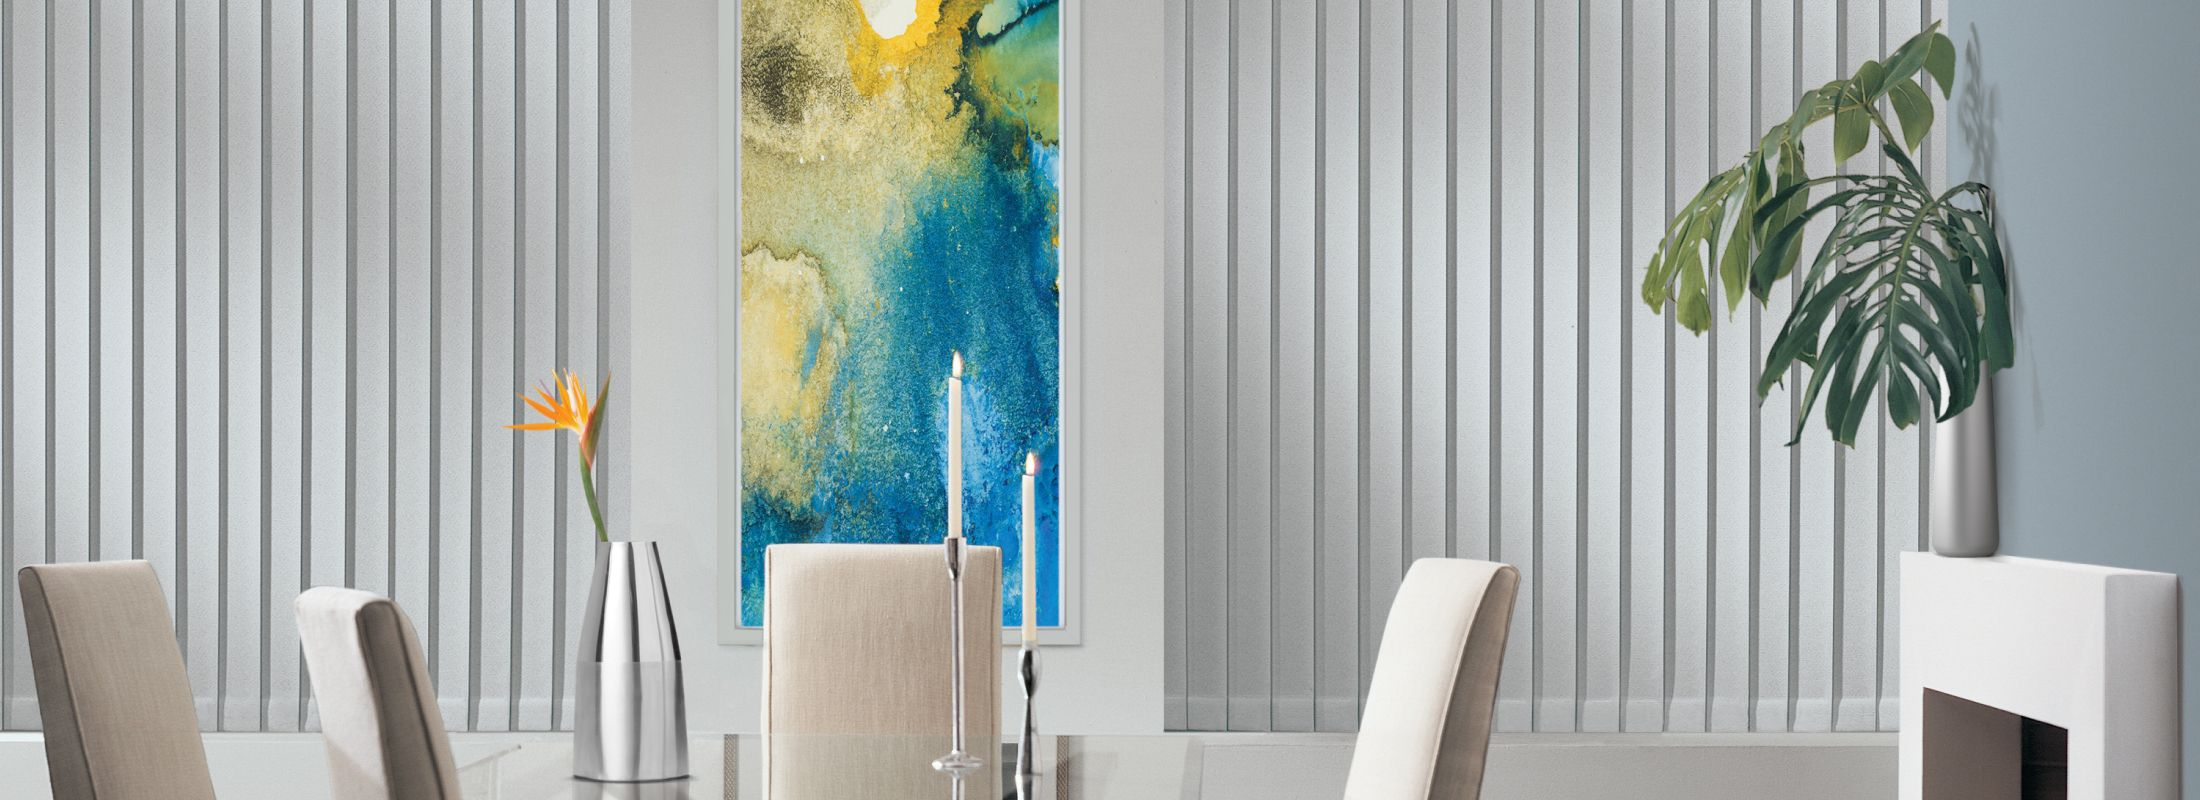 Vinyl blinds in Malta Magentic Grey - Somner